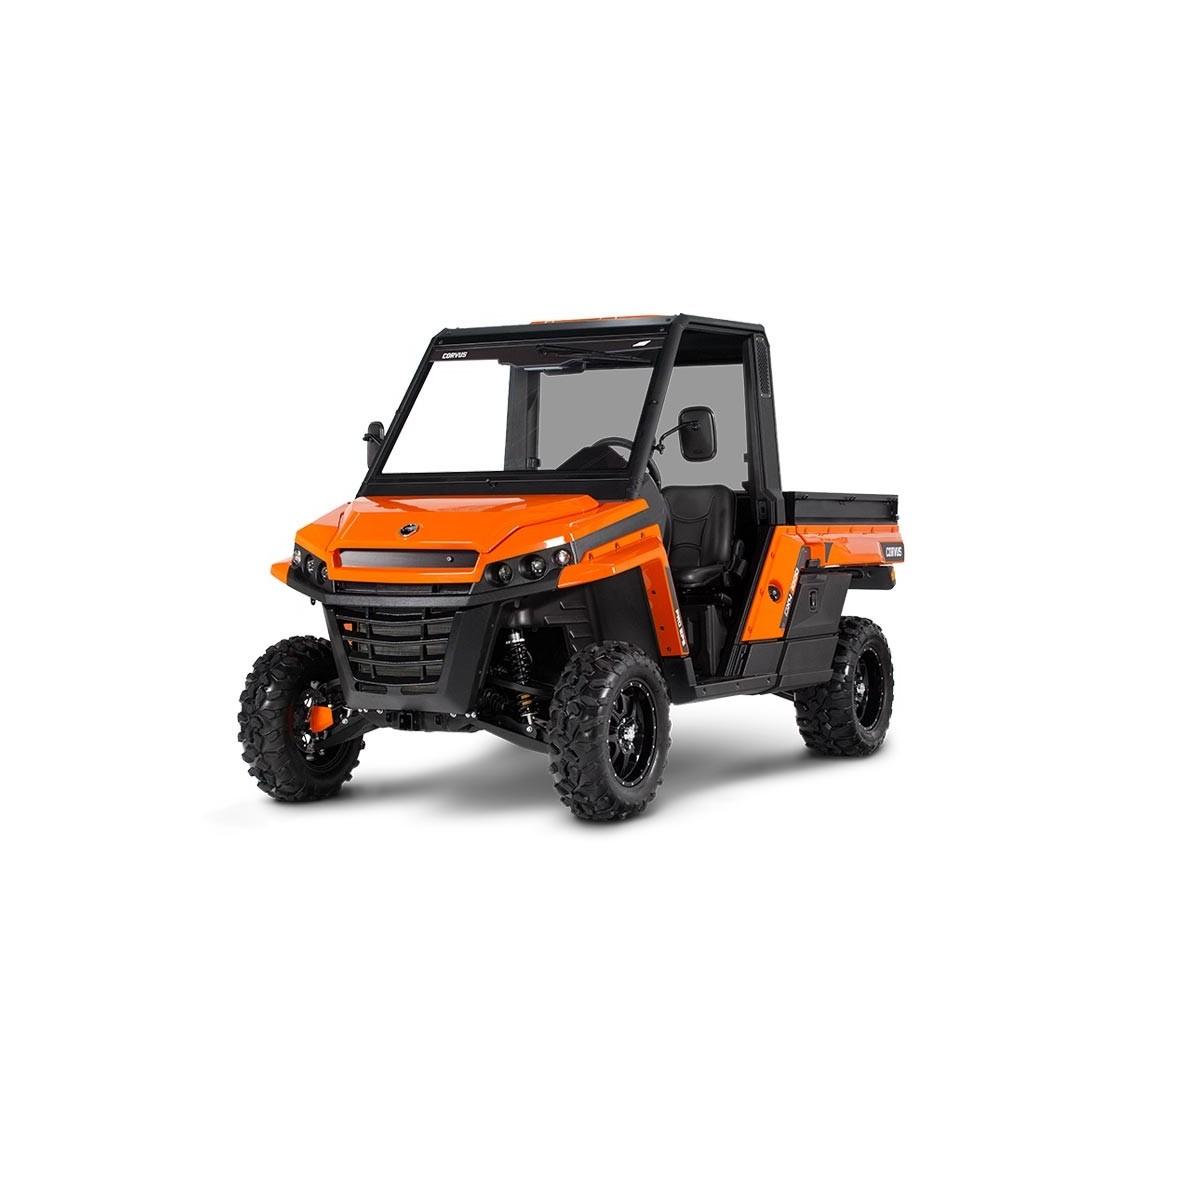 Corvus terrain dx4 pro vehiculo multiusos diesel 24cv+basculante 450kg eur/día